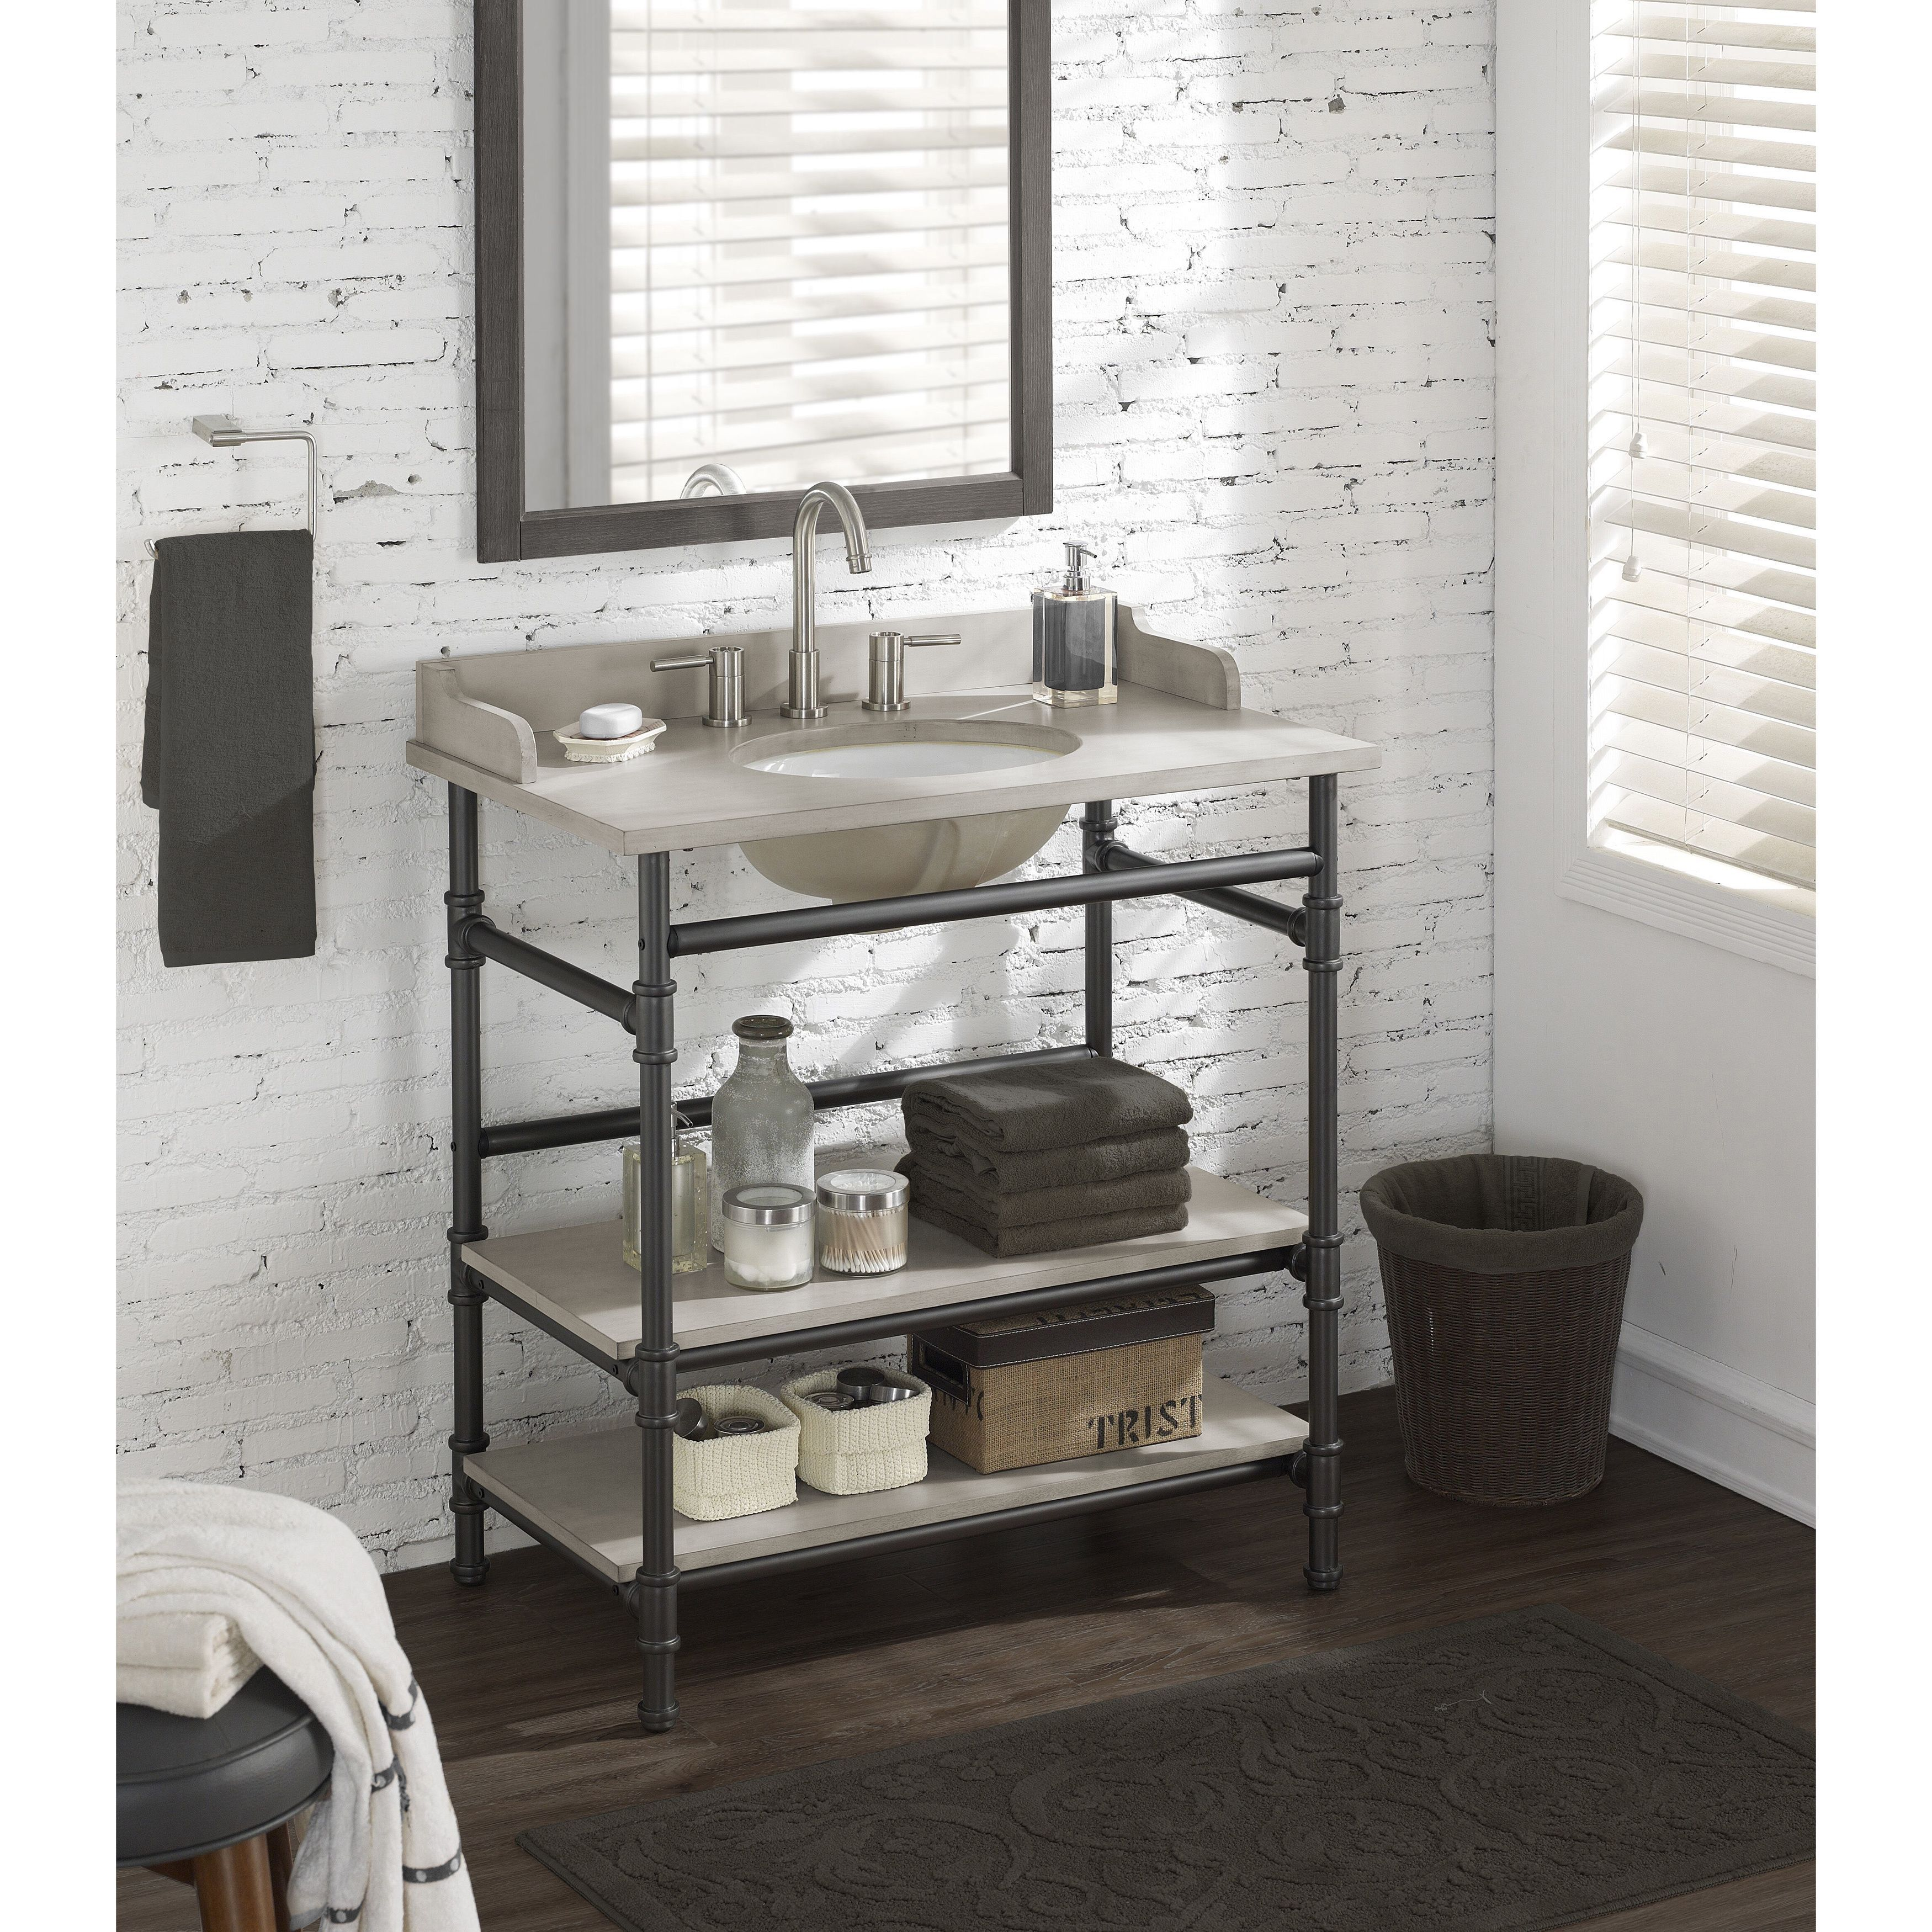 36inch industrial open shelf vanity with backsplash